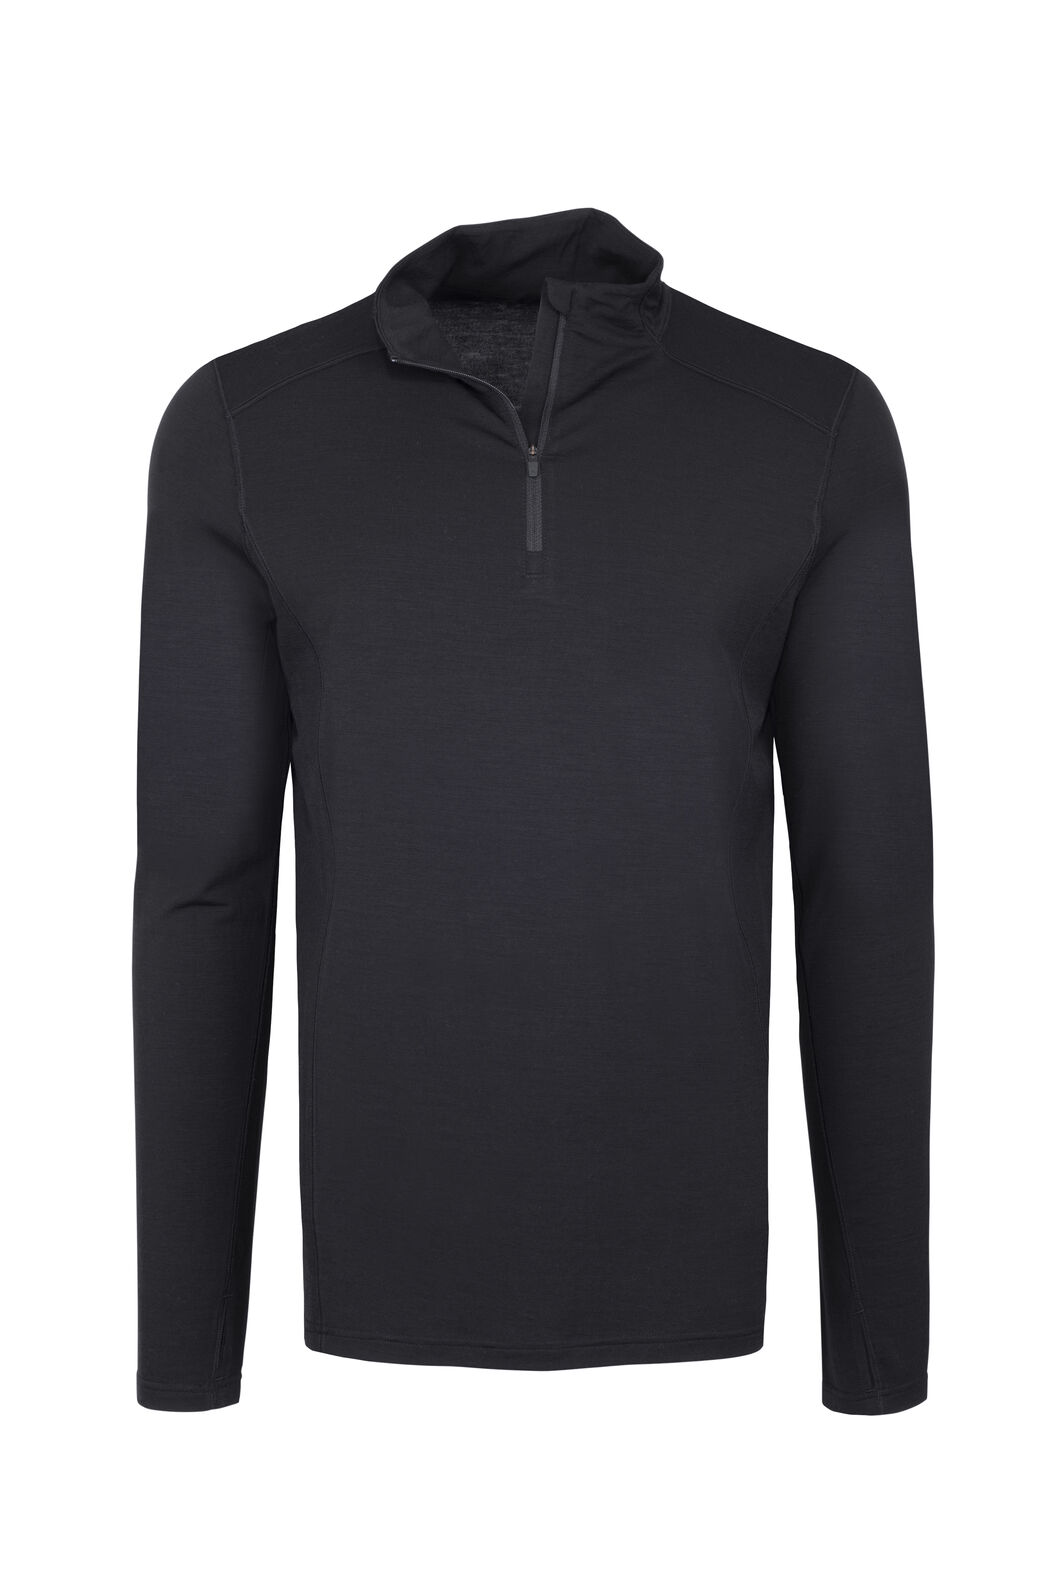 Macpac Men's Merino 180 Half Zip Pullover, Black, hi-res